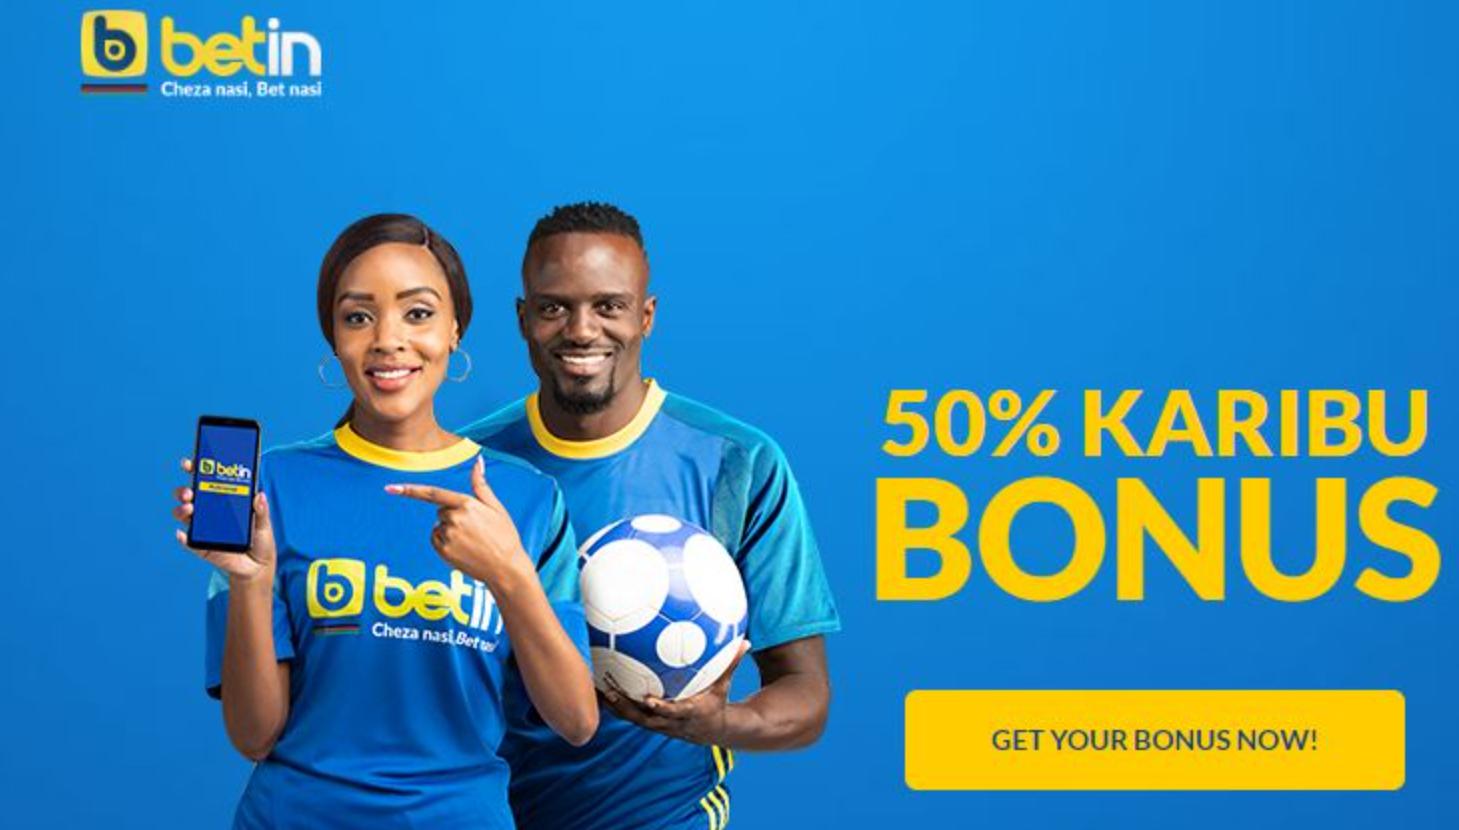 Betin in Kenya bonus